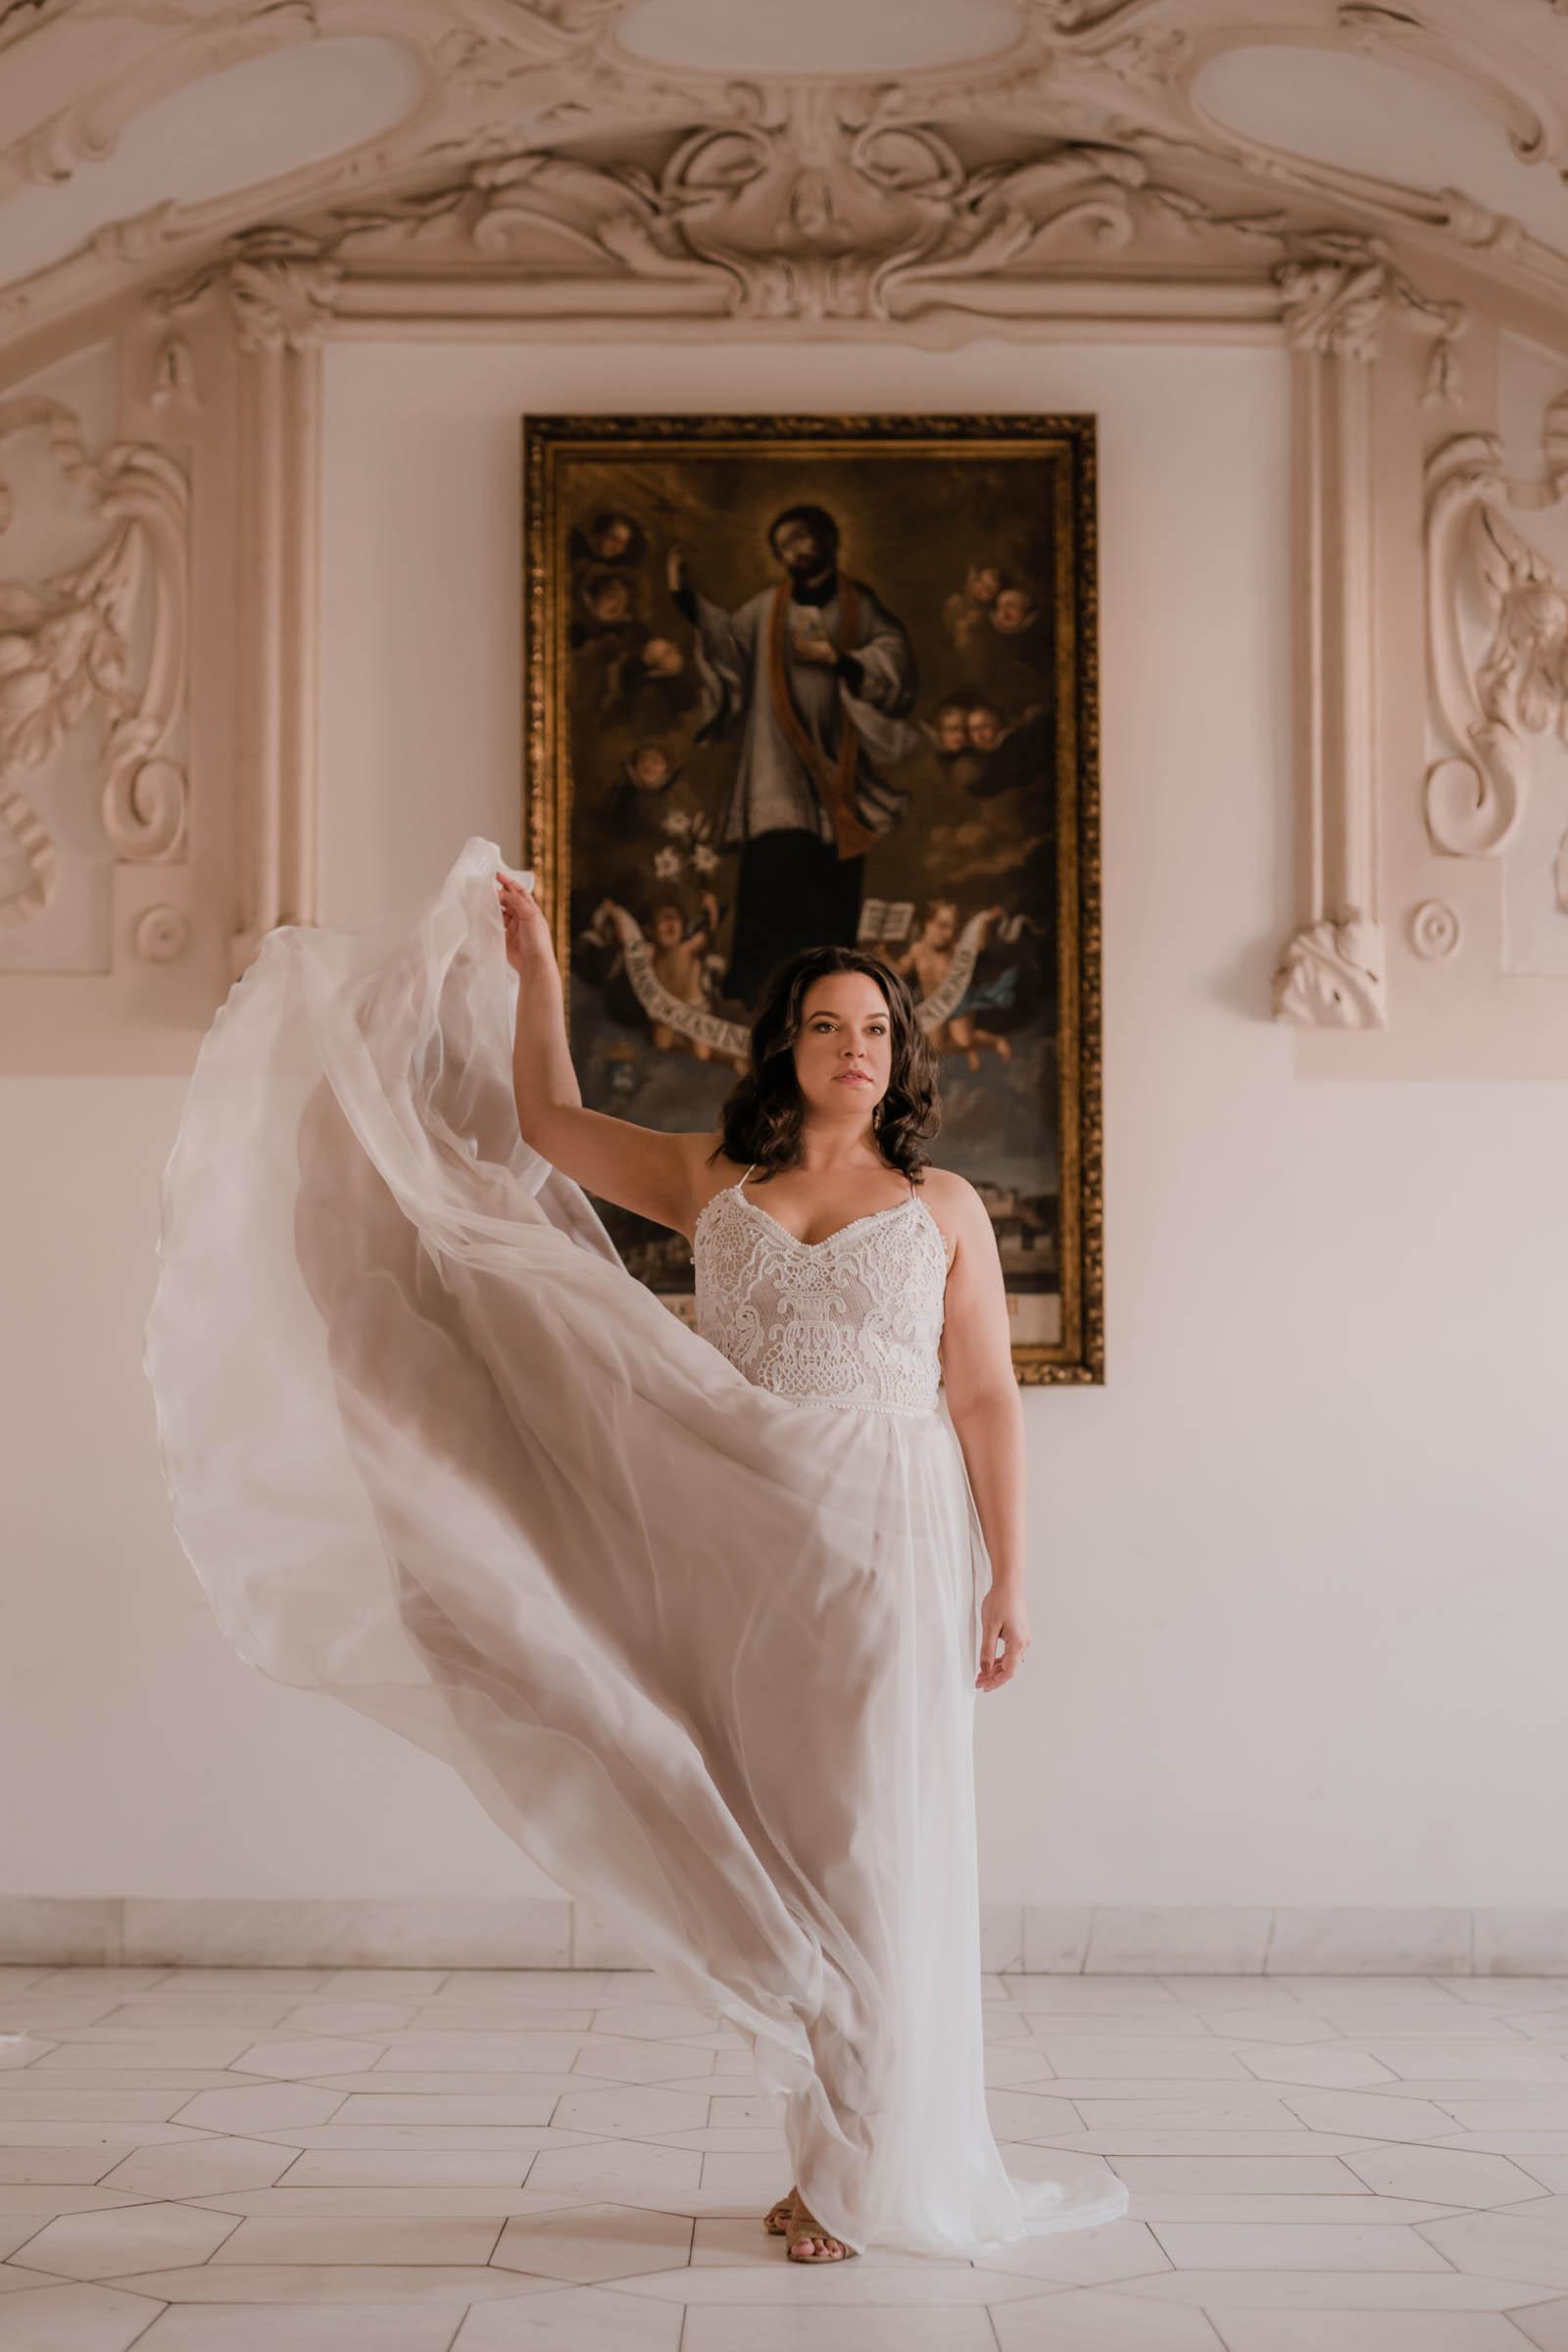 boho-svadobne-saty-veronika-kostkova-wedding-atelier-2019-tavia